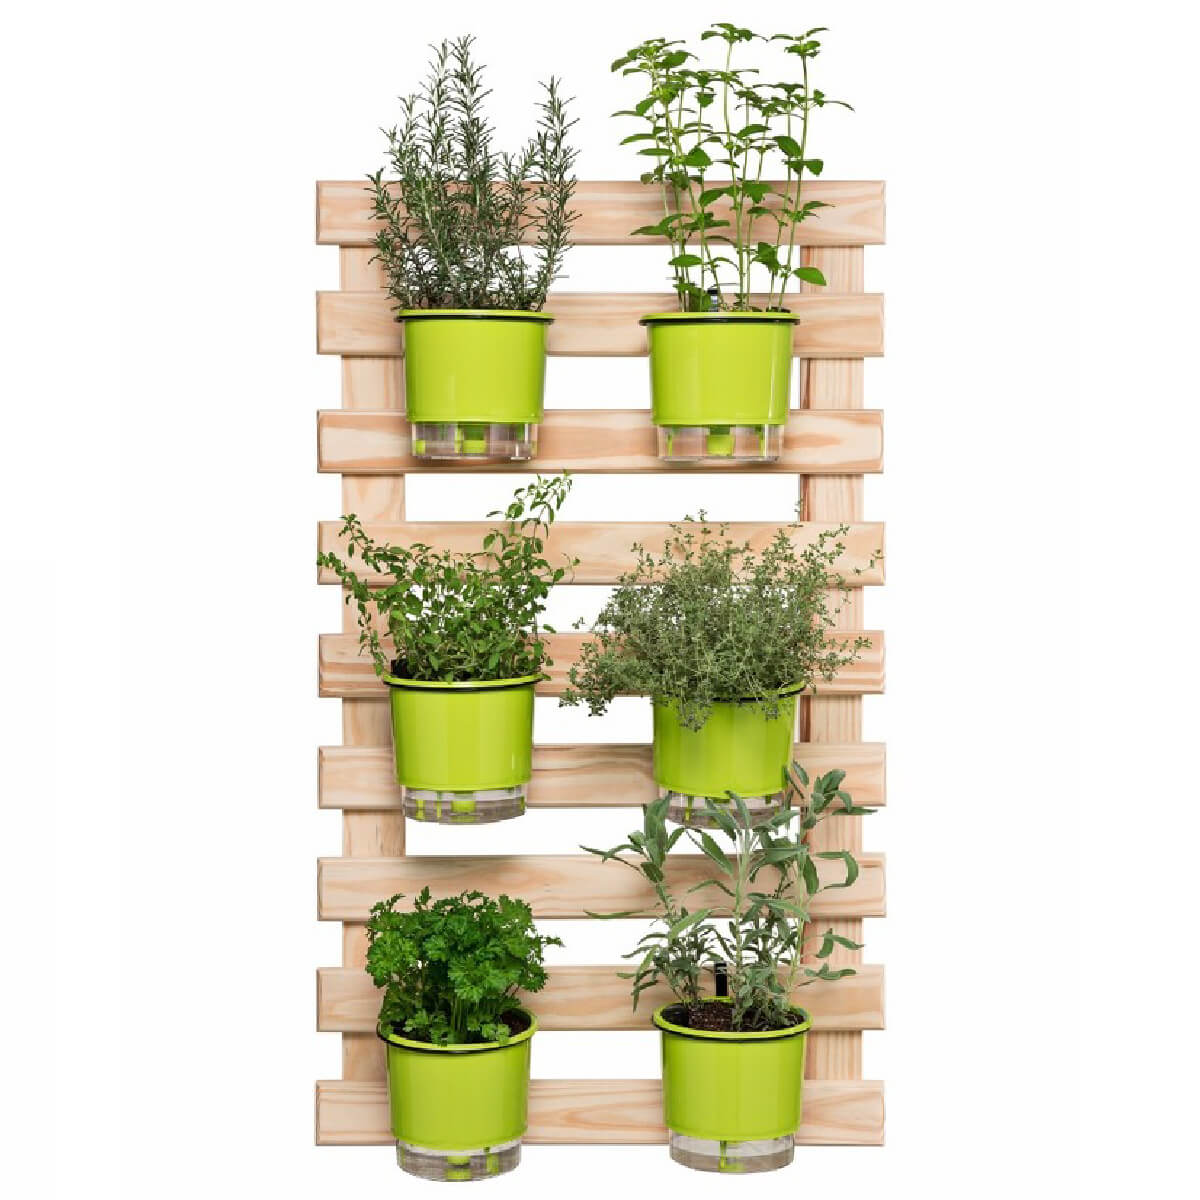 Kit Horta Vertical 60cm x 100cm com 6 Vasos Verdes  - Loja Raiz